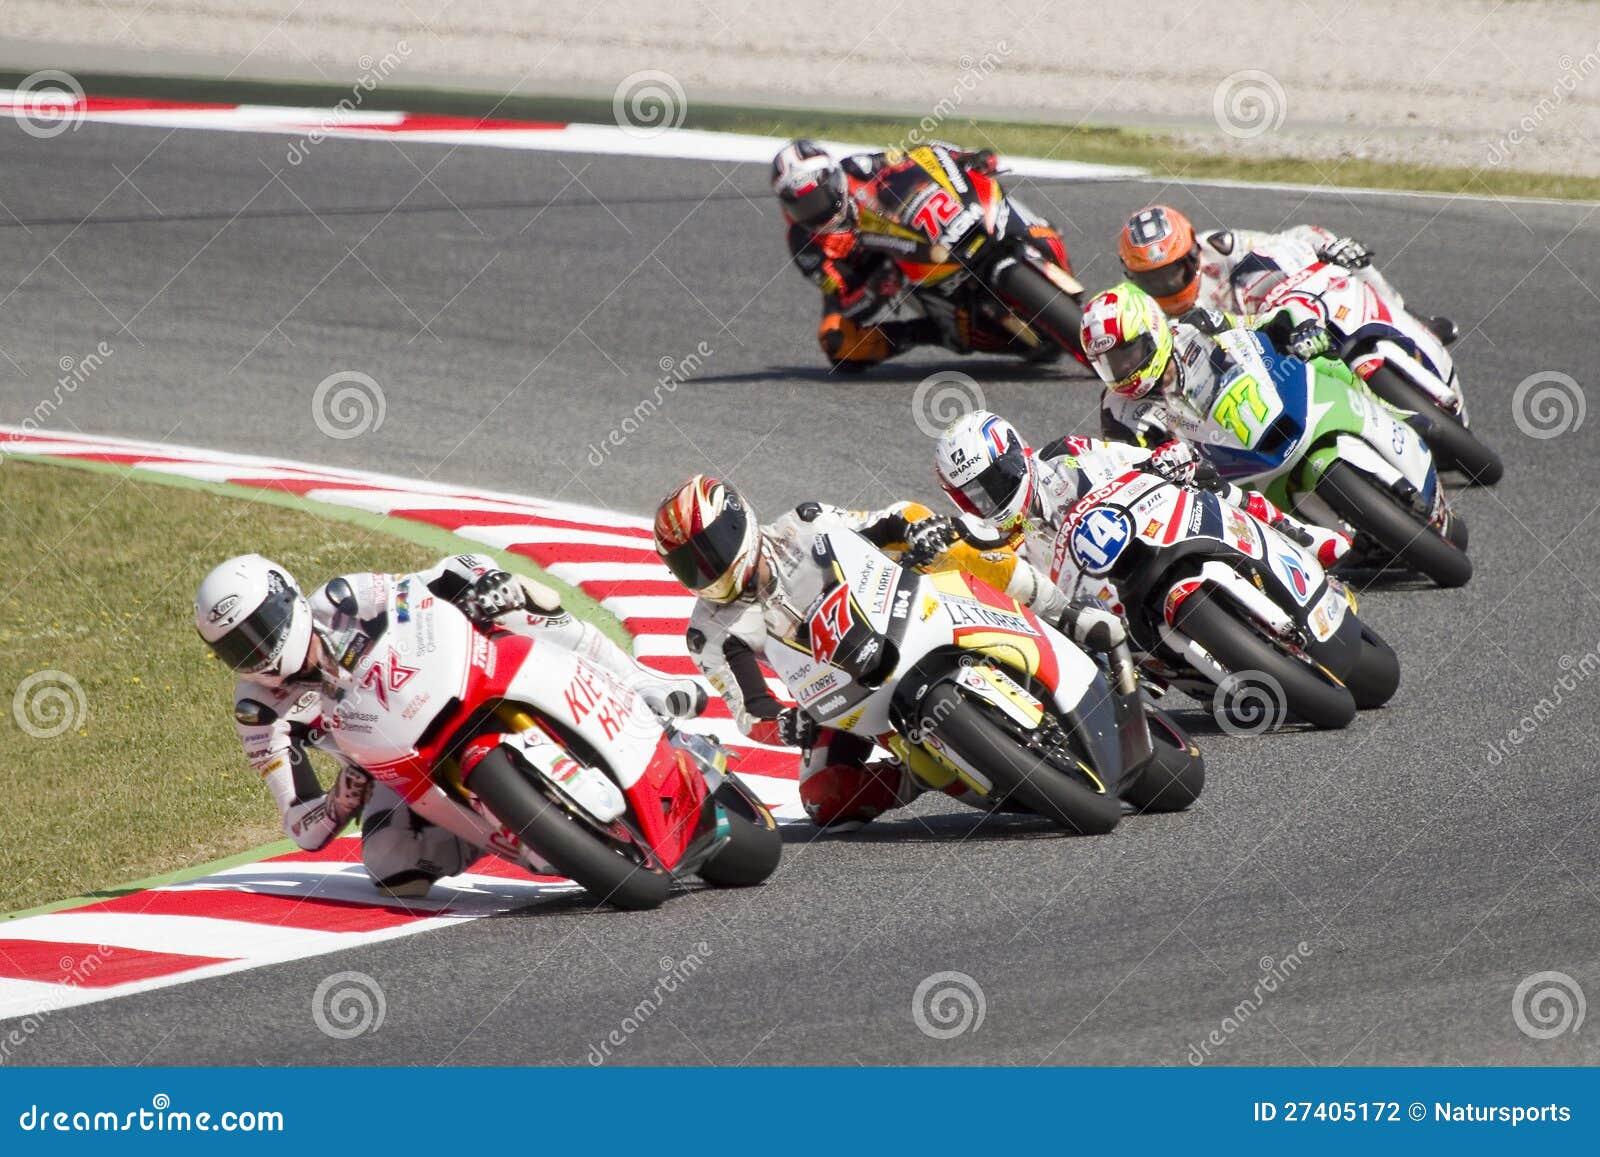 Corsa delle motociclette